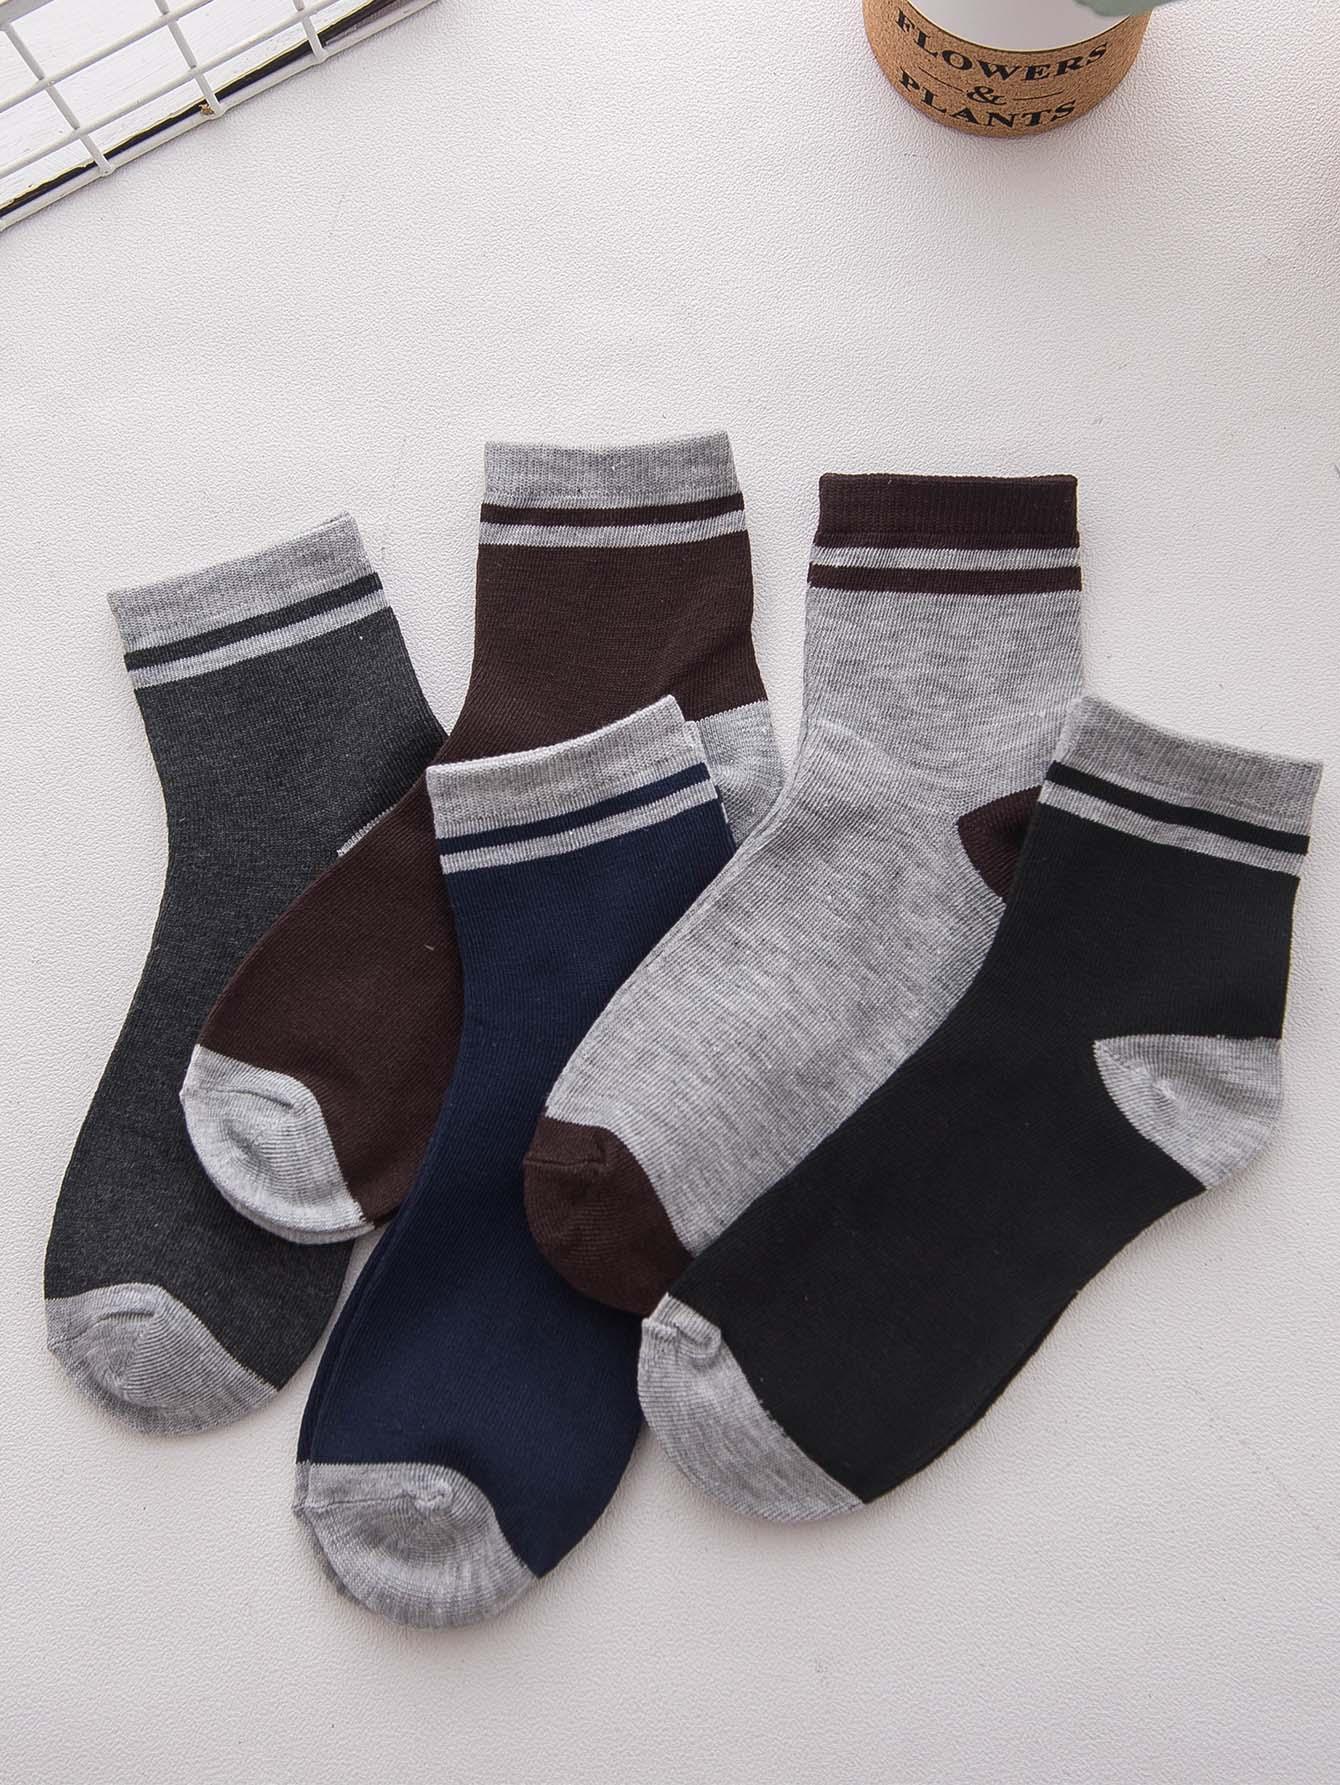 Männer Socken 5Paare mit Kontrast Saum